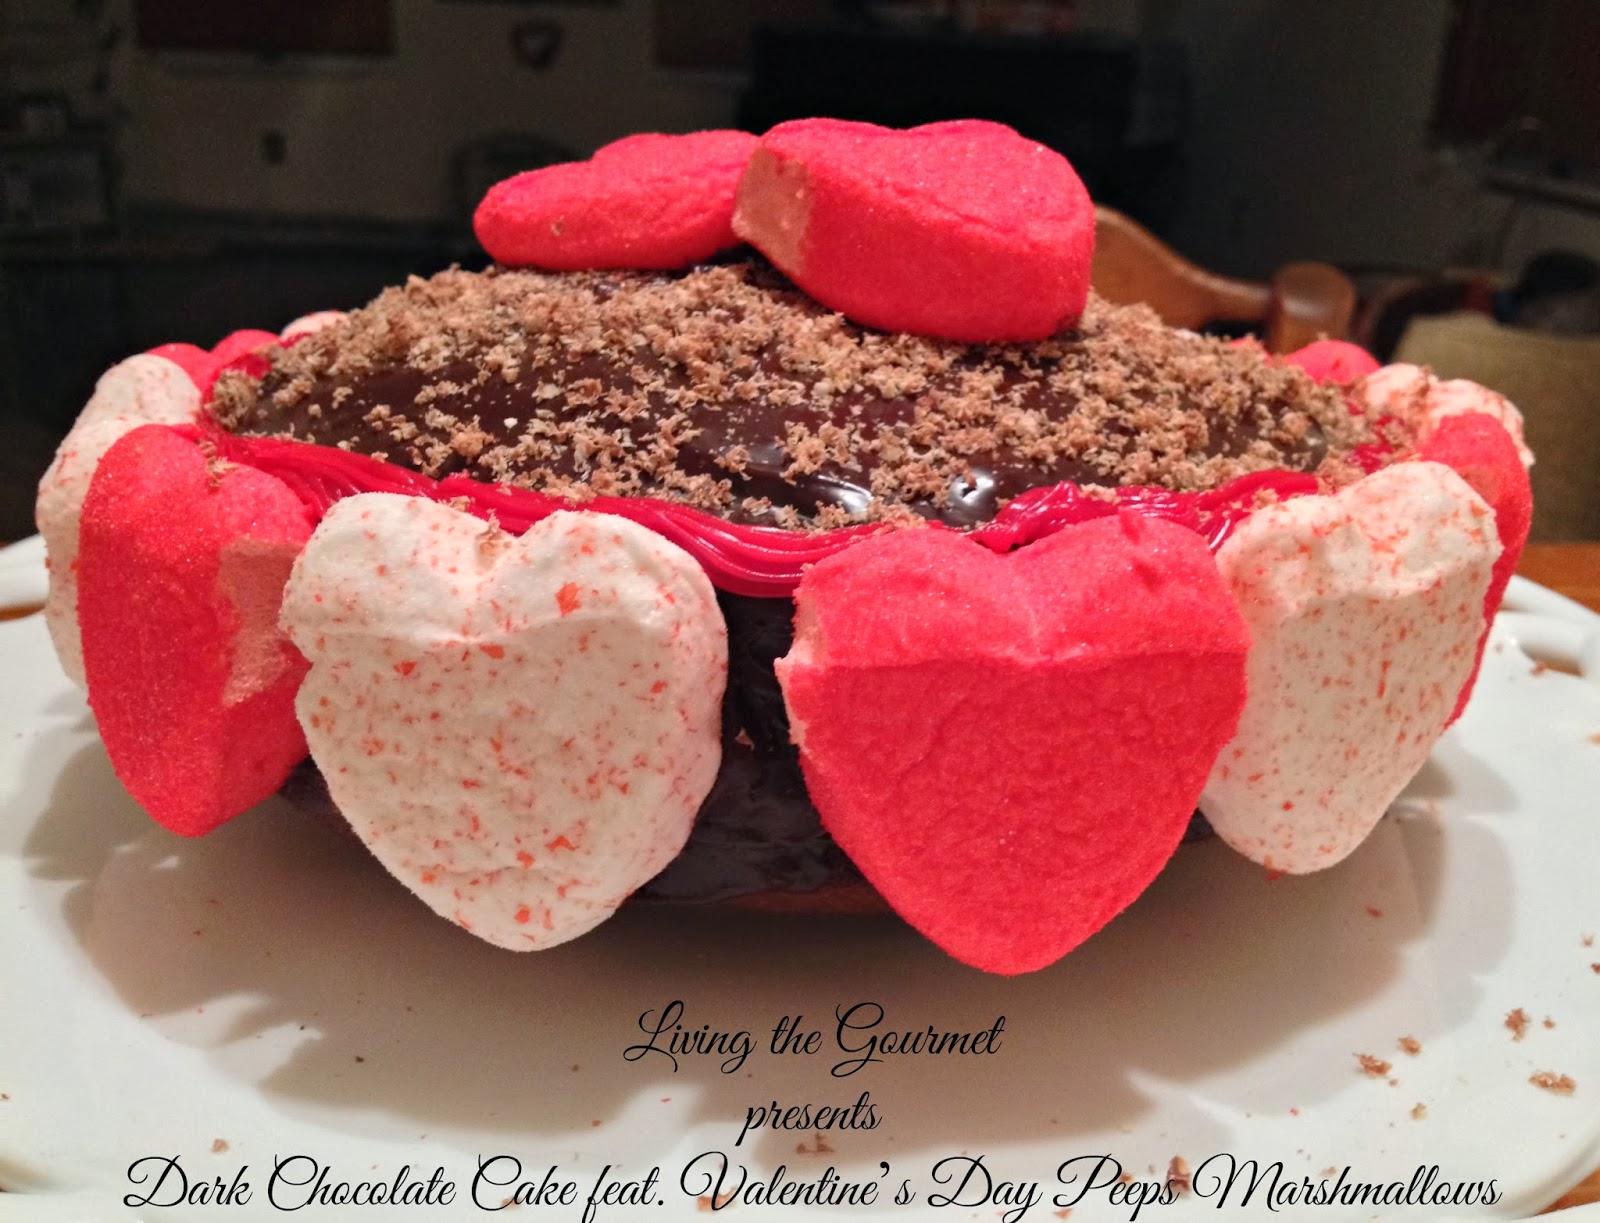 Dark Chocolate Cake Featuring Valentineu0027s Day Peeps Marshmallows